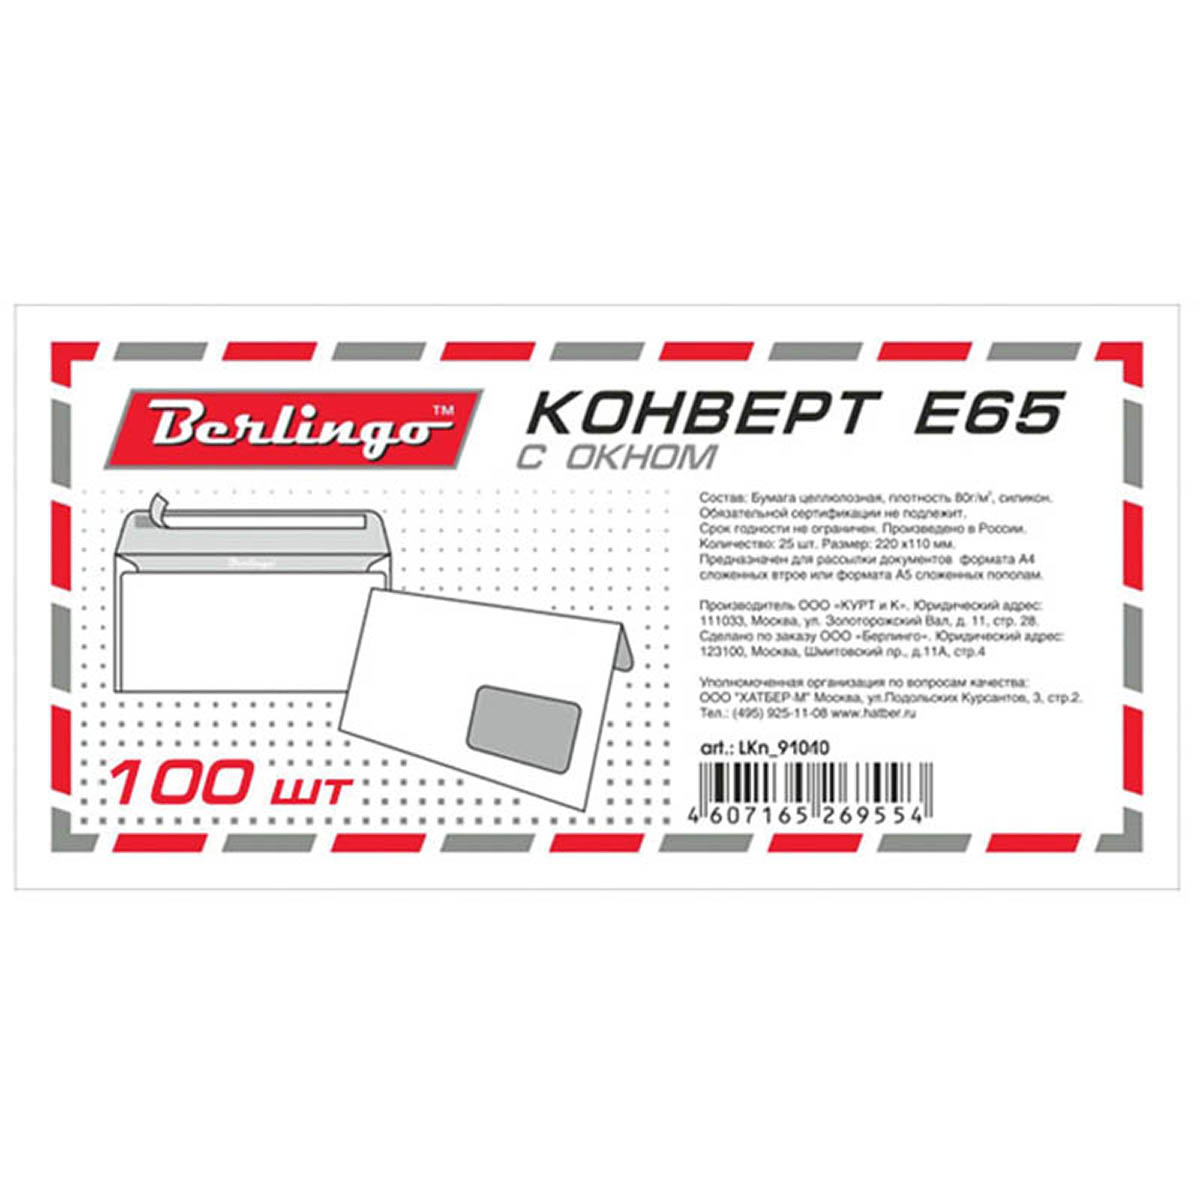 Конверт E65 100 шт LKn_91010 -